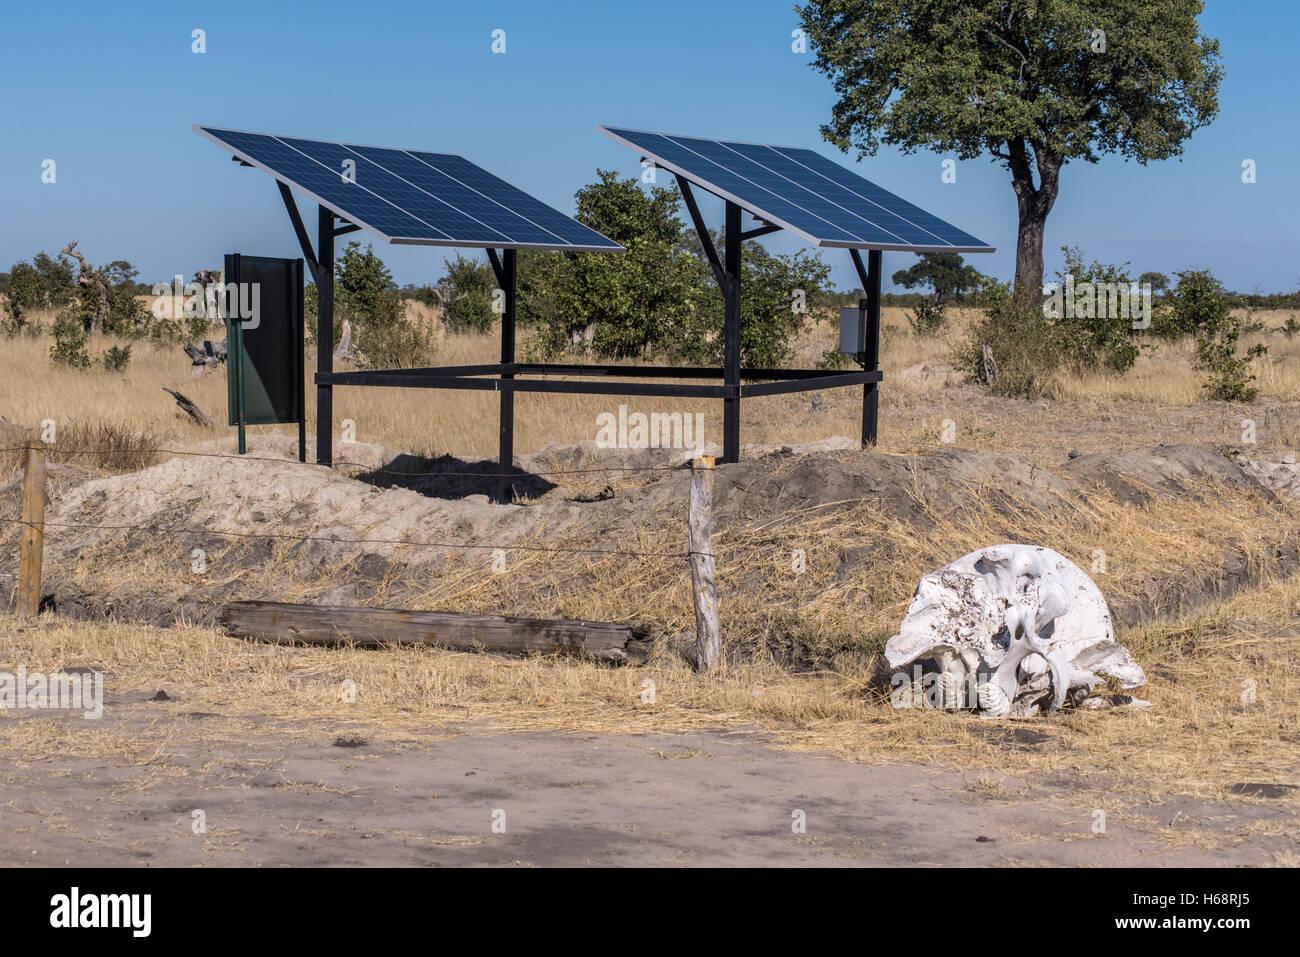 Solar Panels to power a water pump at Shumba in Hwange National Park Zimbabwe - Stock Image